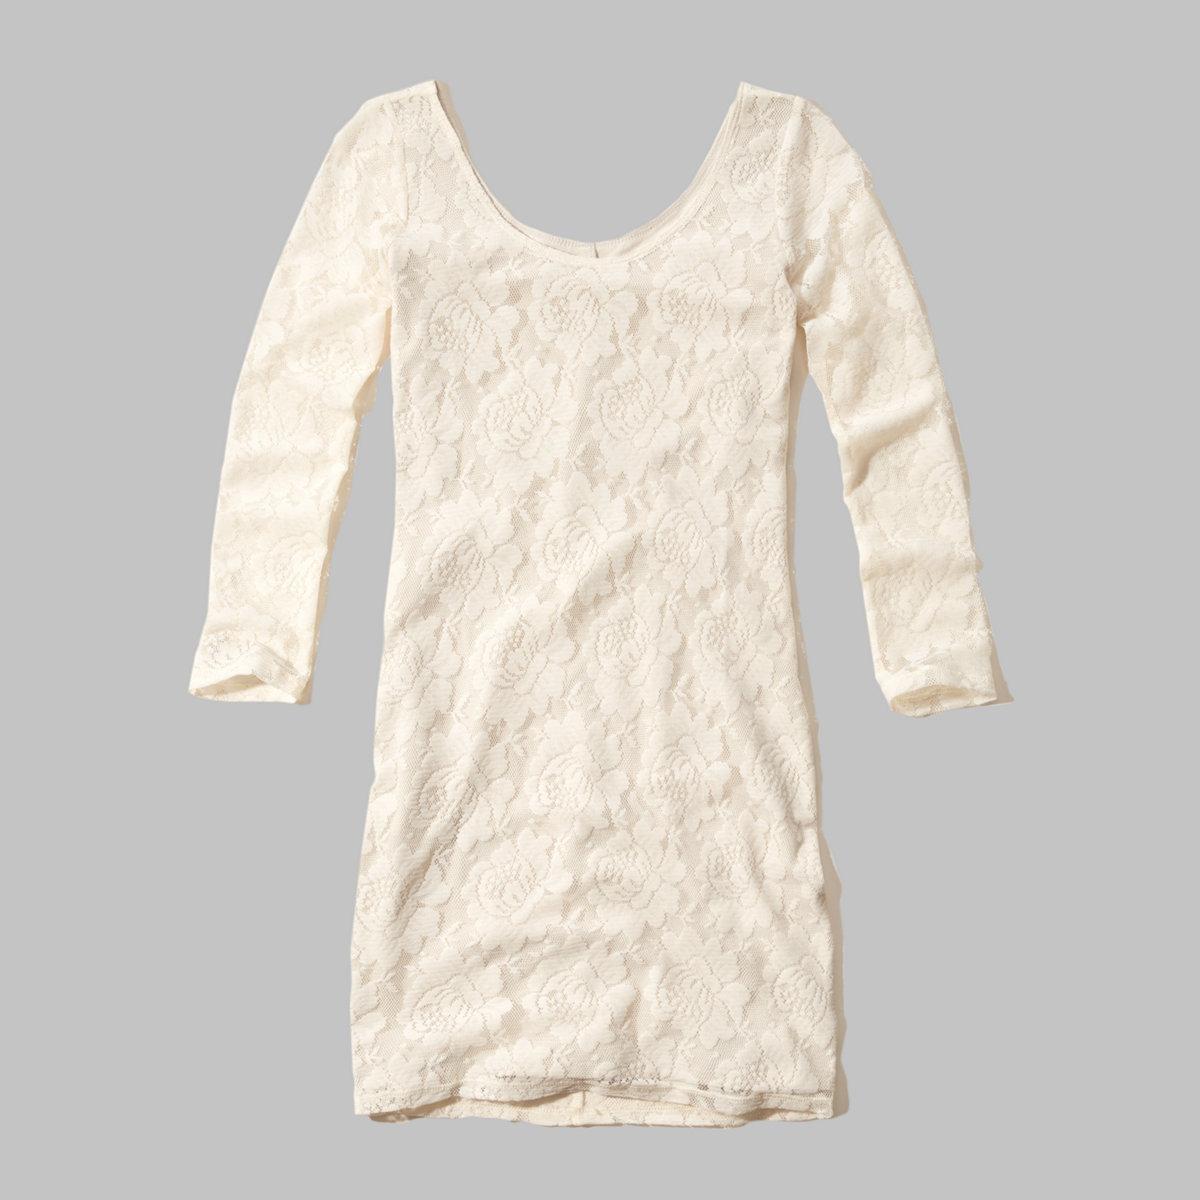 West Street Lace Bodycon Dress